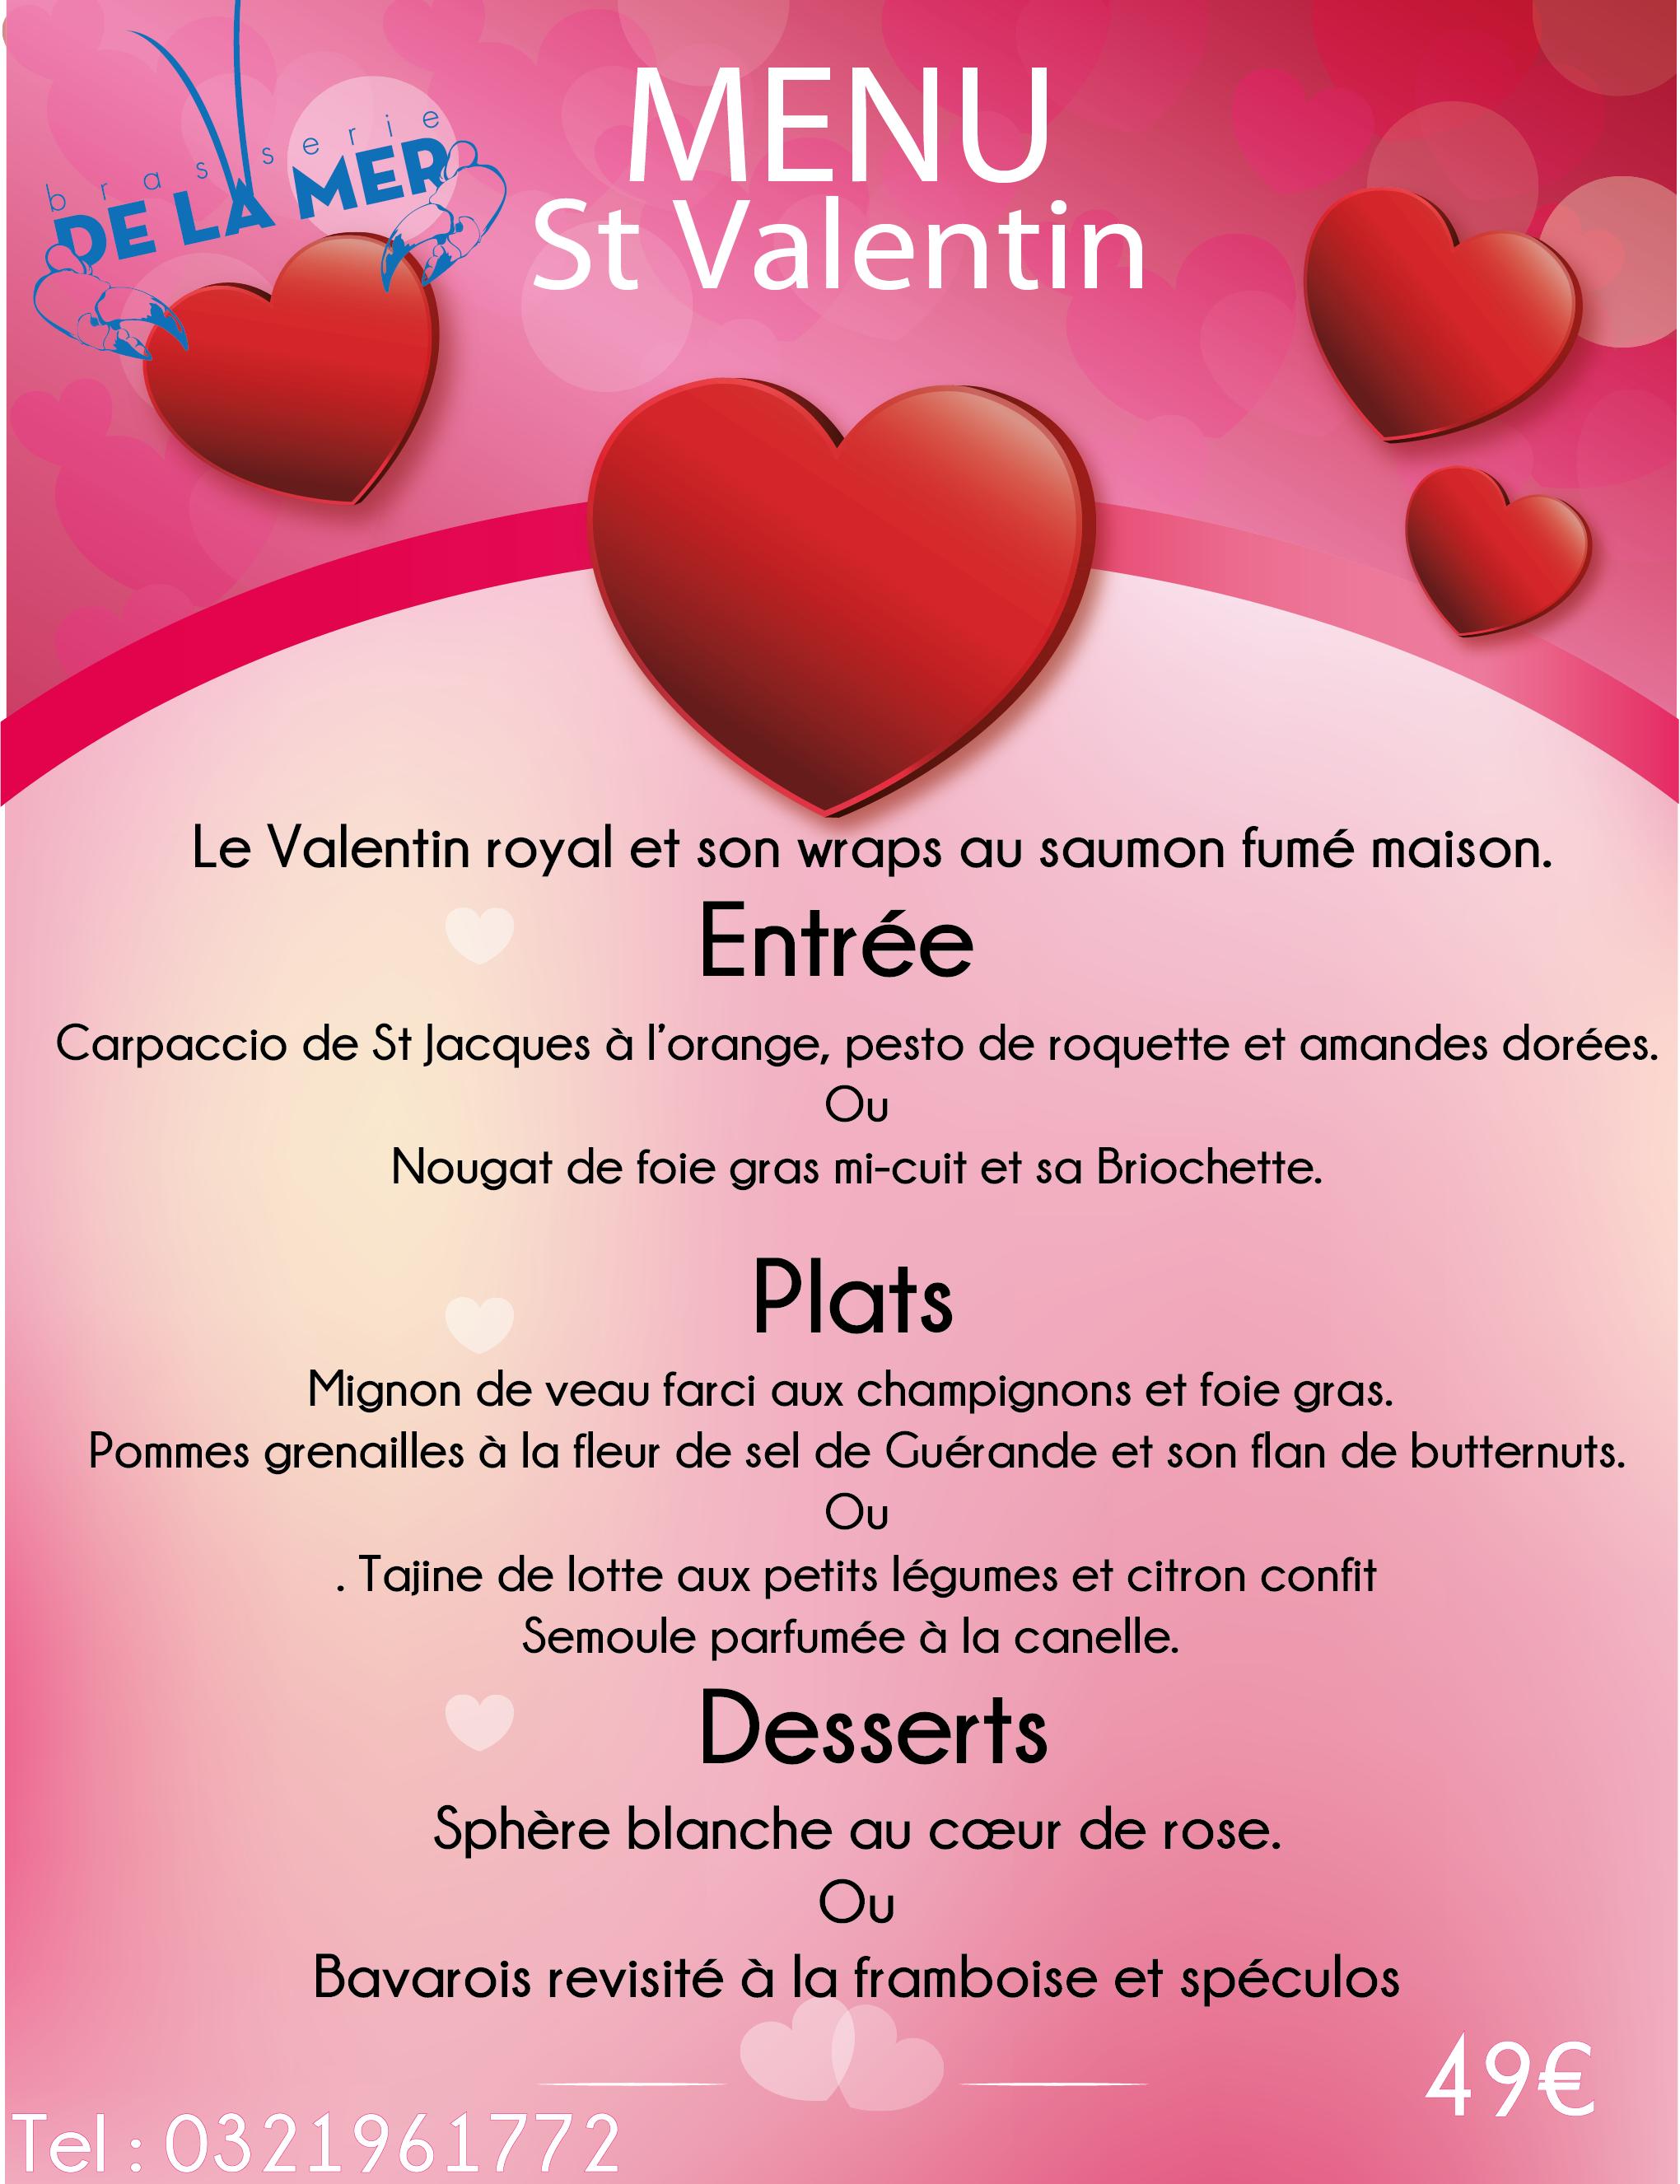 menu-de-st-valentin-01